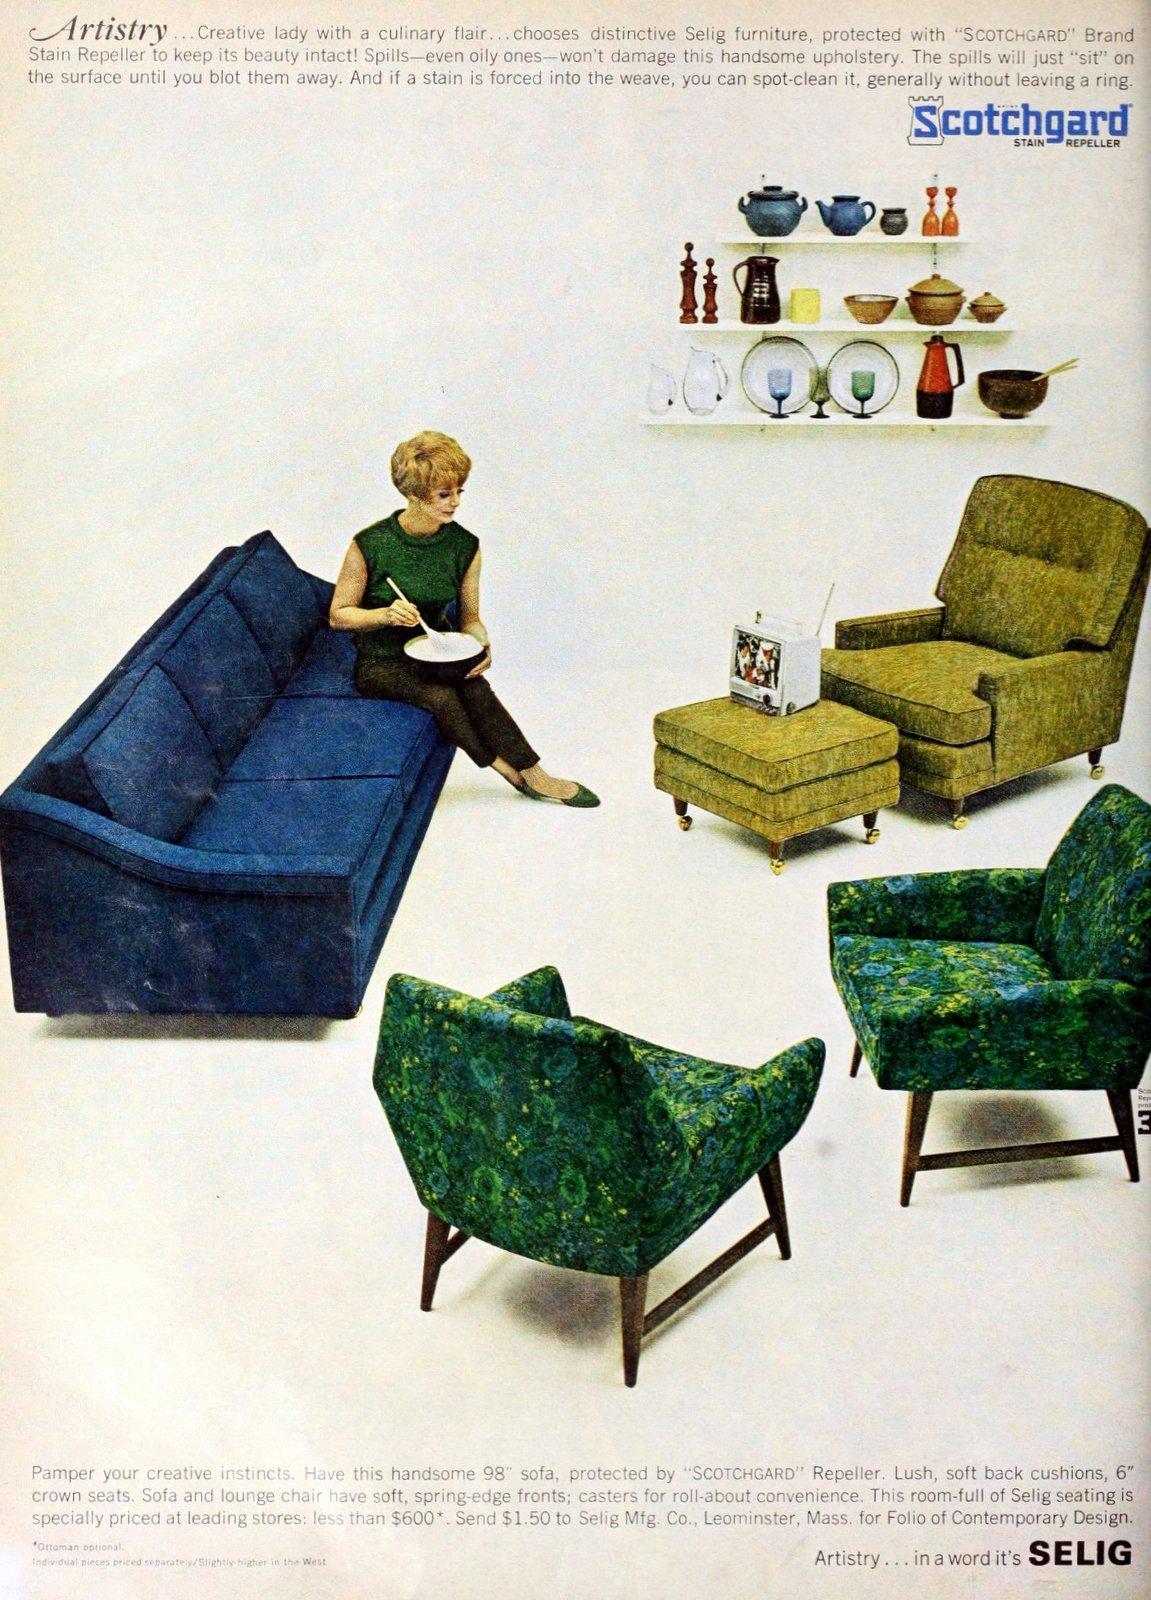 Artistic Selig upholstered mod 60s living room furniture styles (1966)